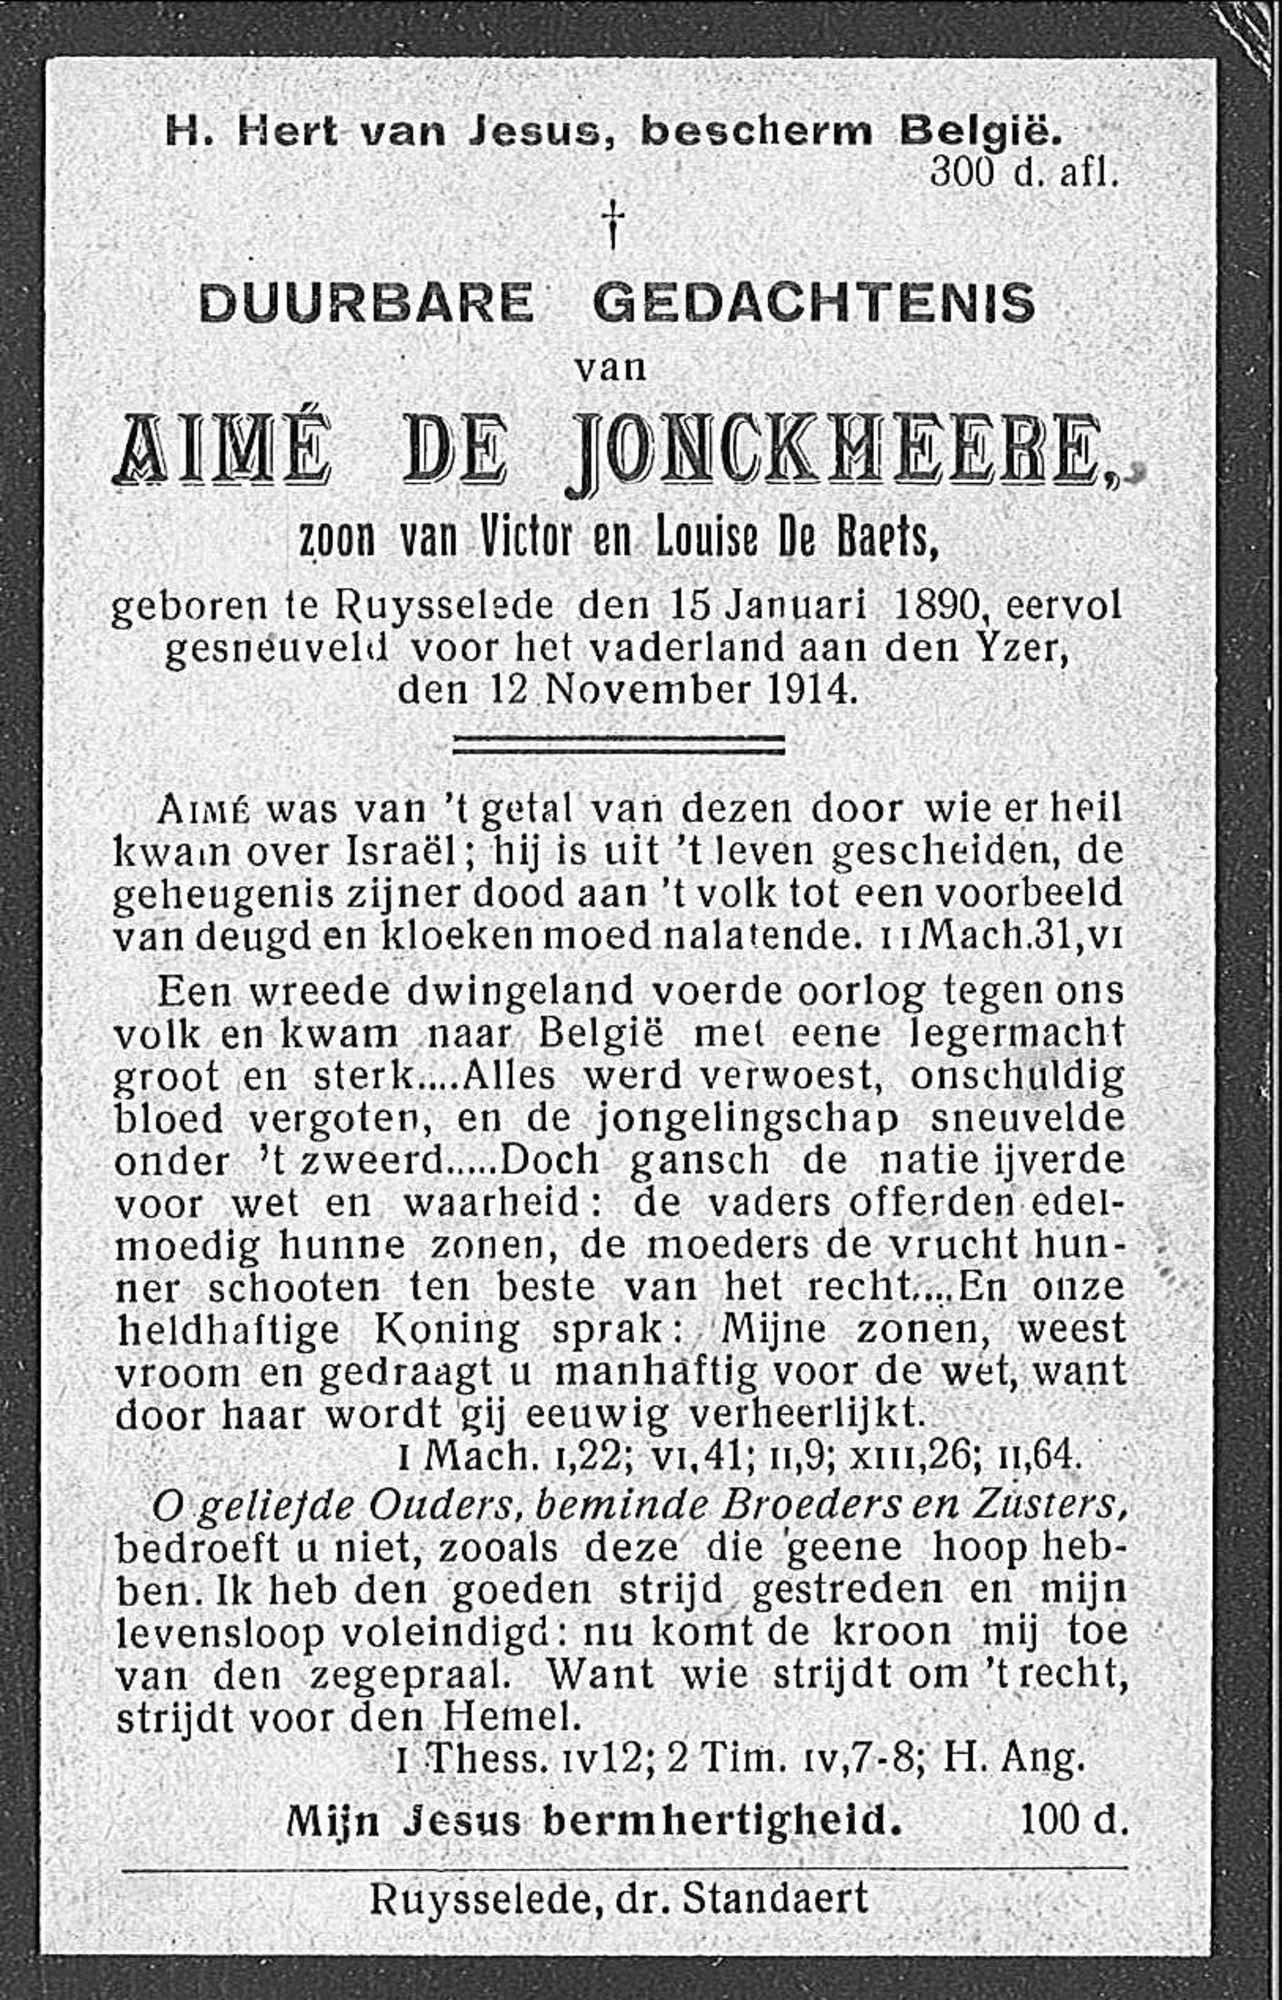 Aimé De Jonckheere